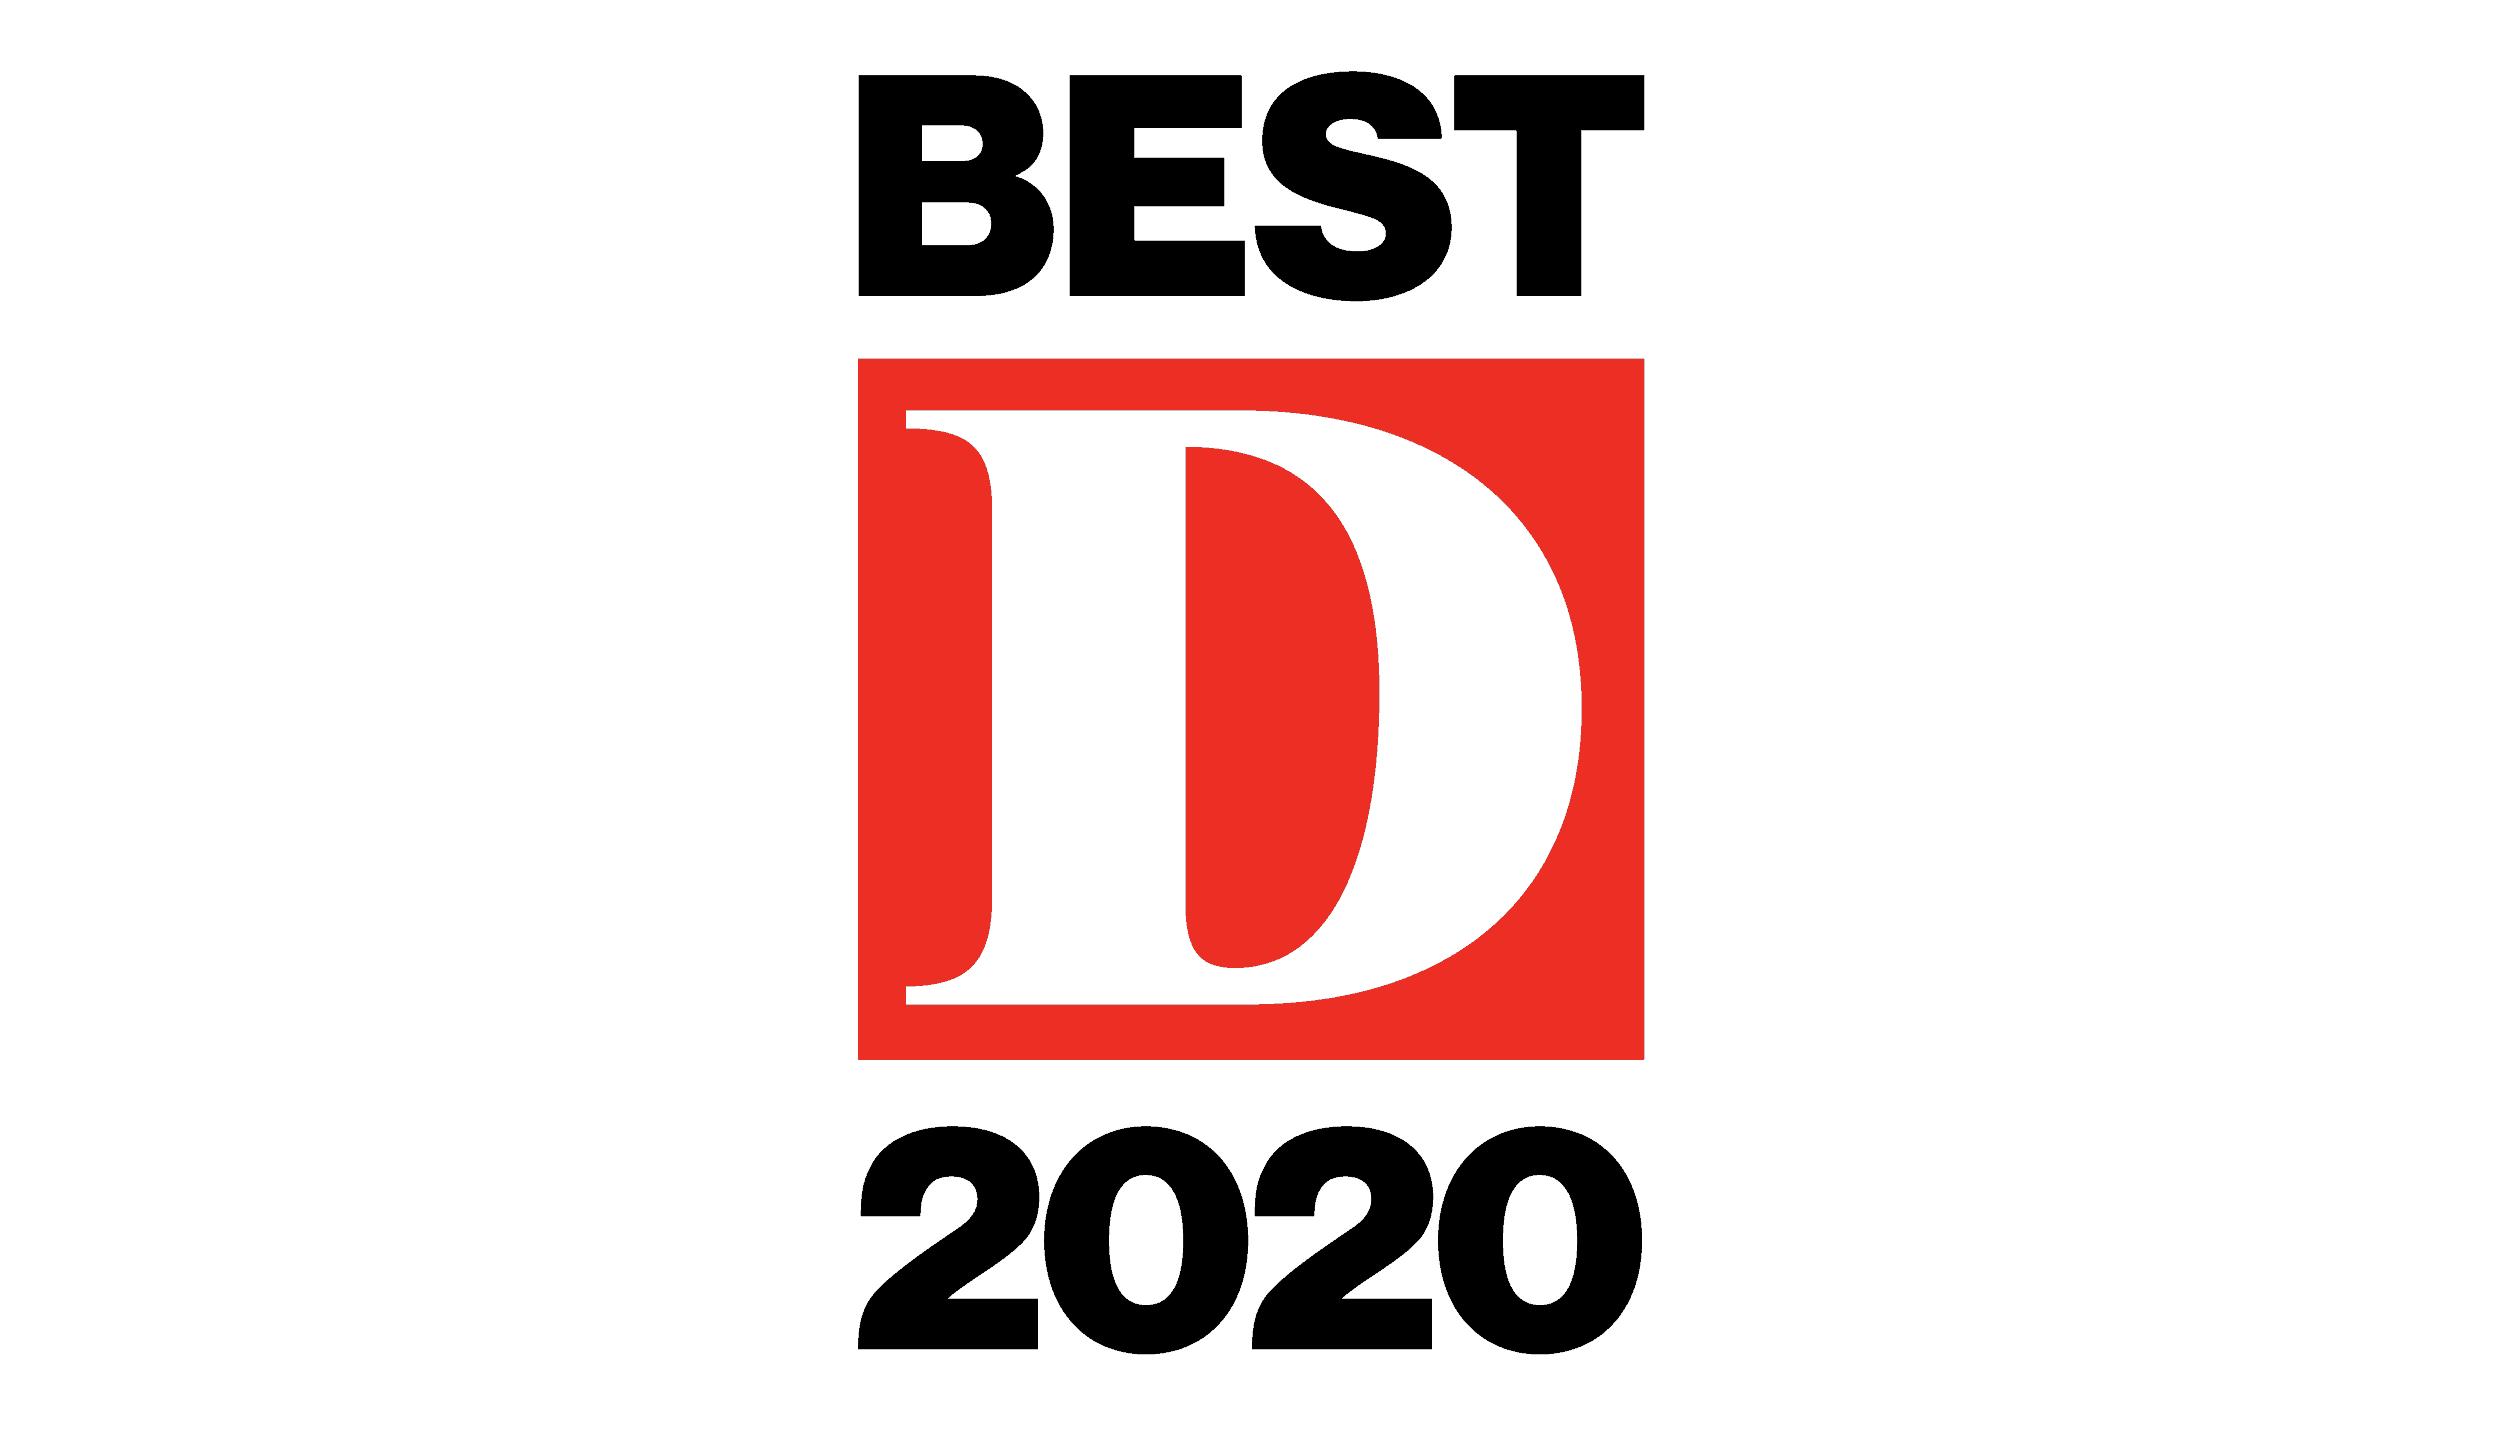 Dr. Chris Miller named 2020 Best Doctor By D Magazine